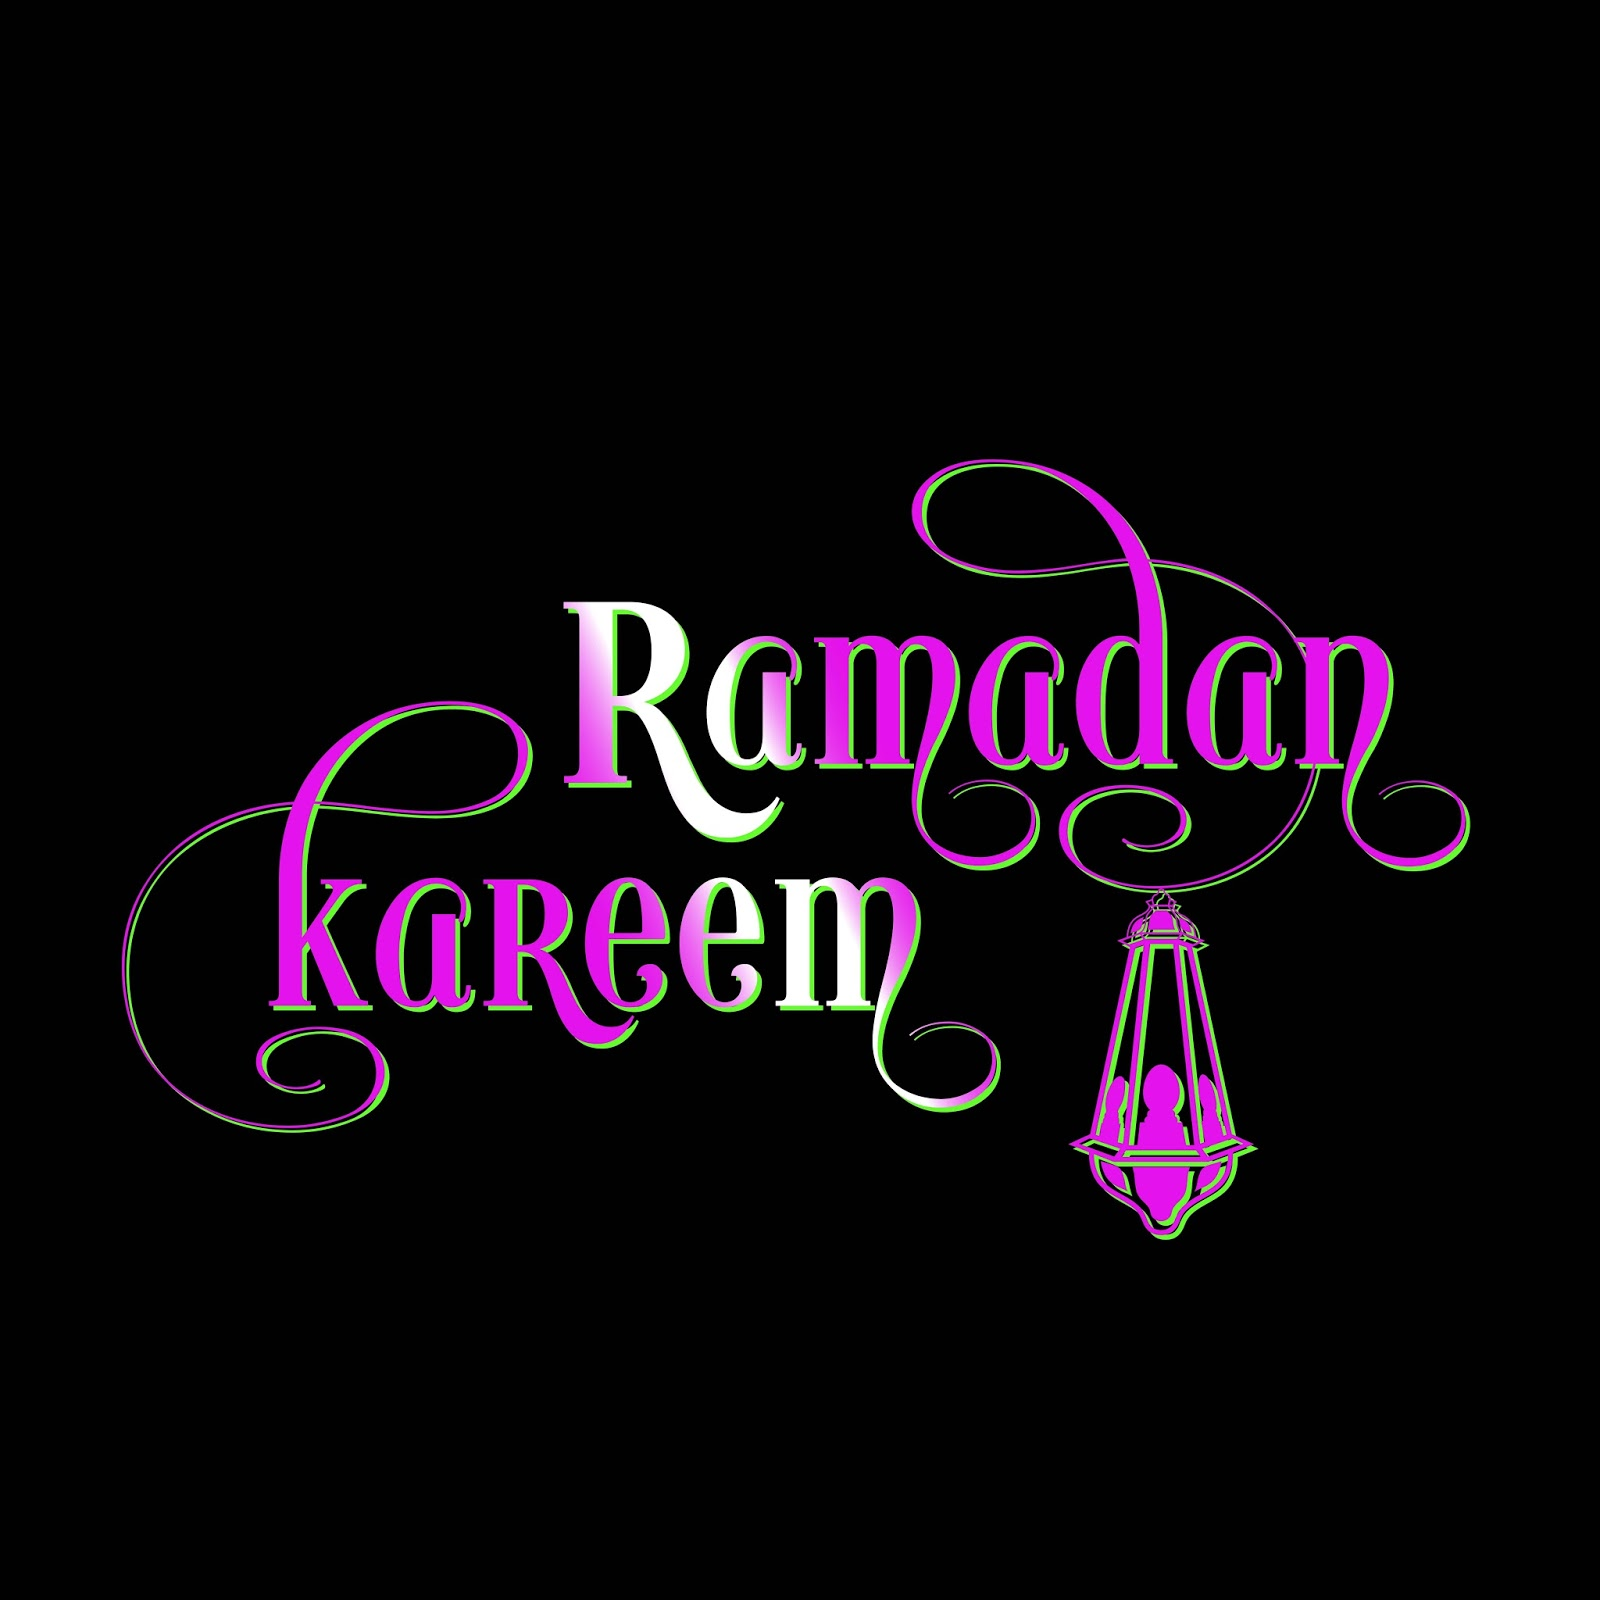 Shayari urdu imagesurdu shayari with pictureurdu shayari ramadan kareem wishes greetings messages 2016 kristyandbryce Choice Image